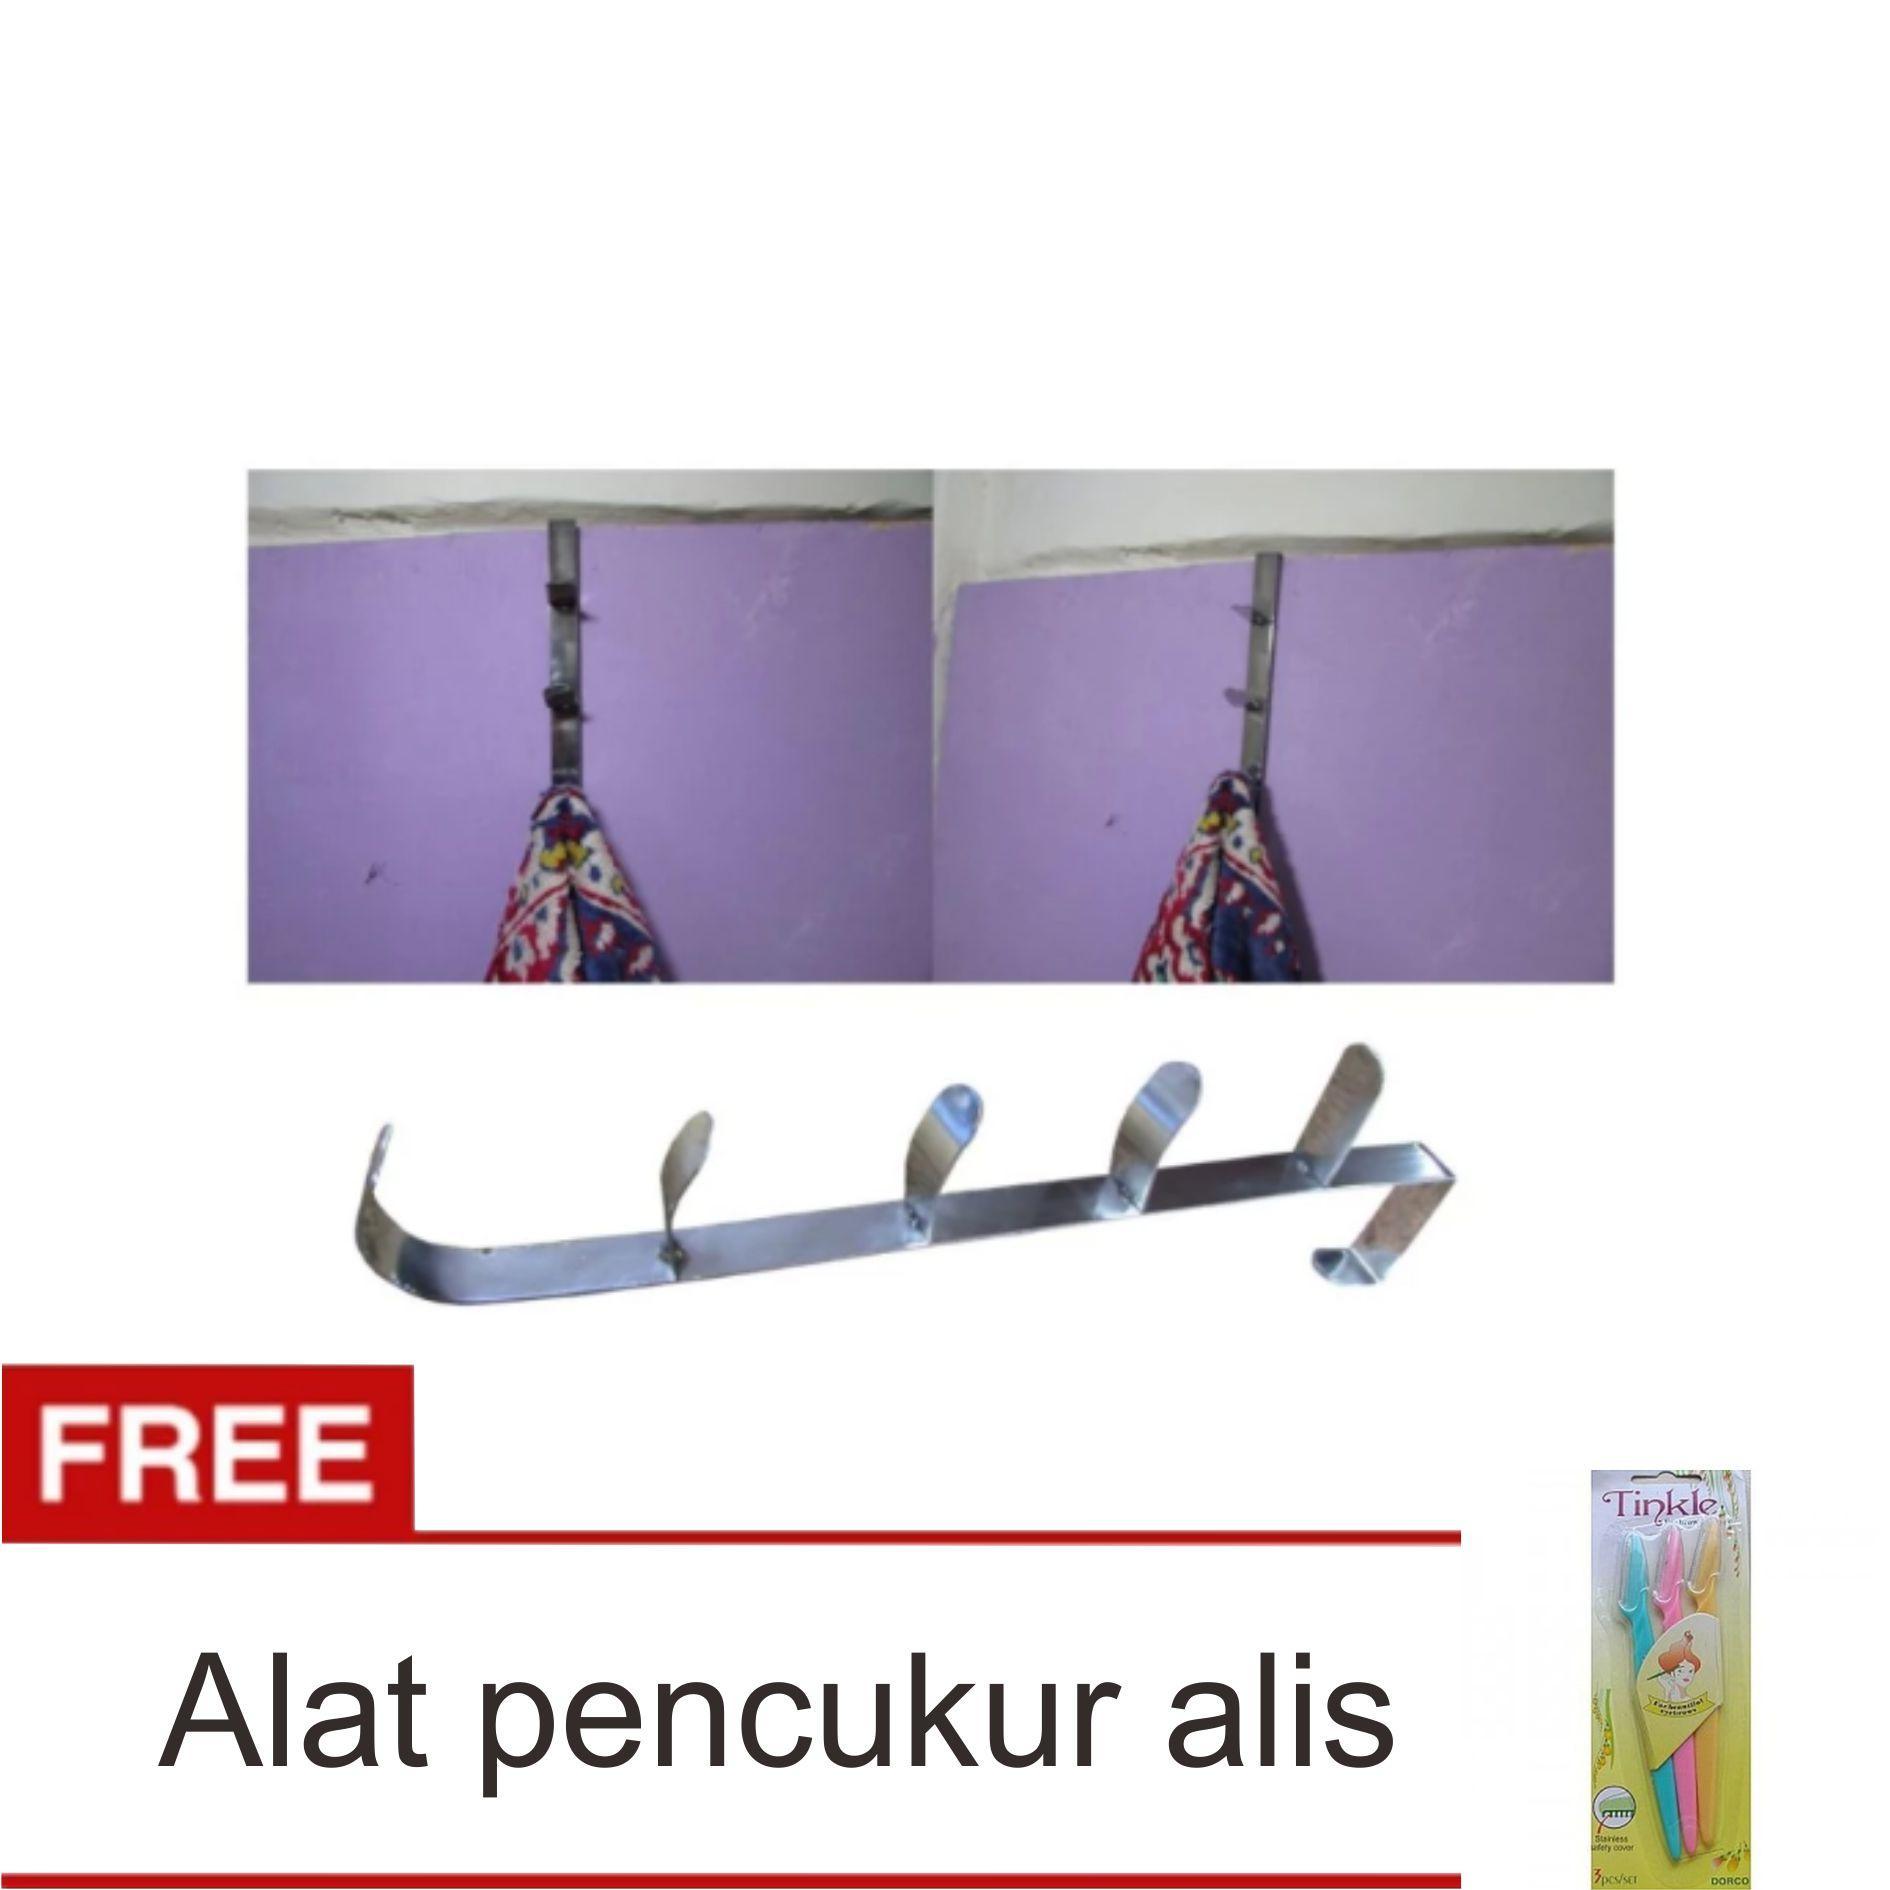 Lanjarjaya Stainless Steel Hook Hanger Gantungan Baju Di Belakang Pintu + Pencukur Alis Set